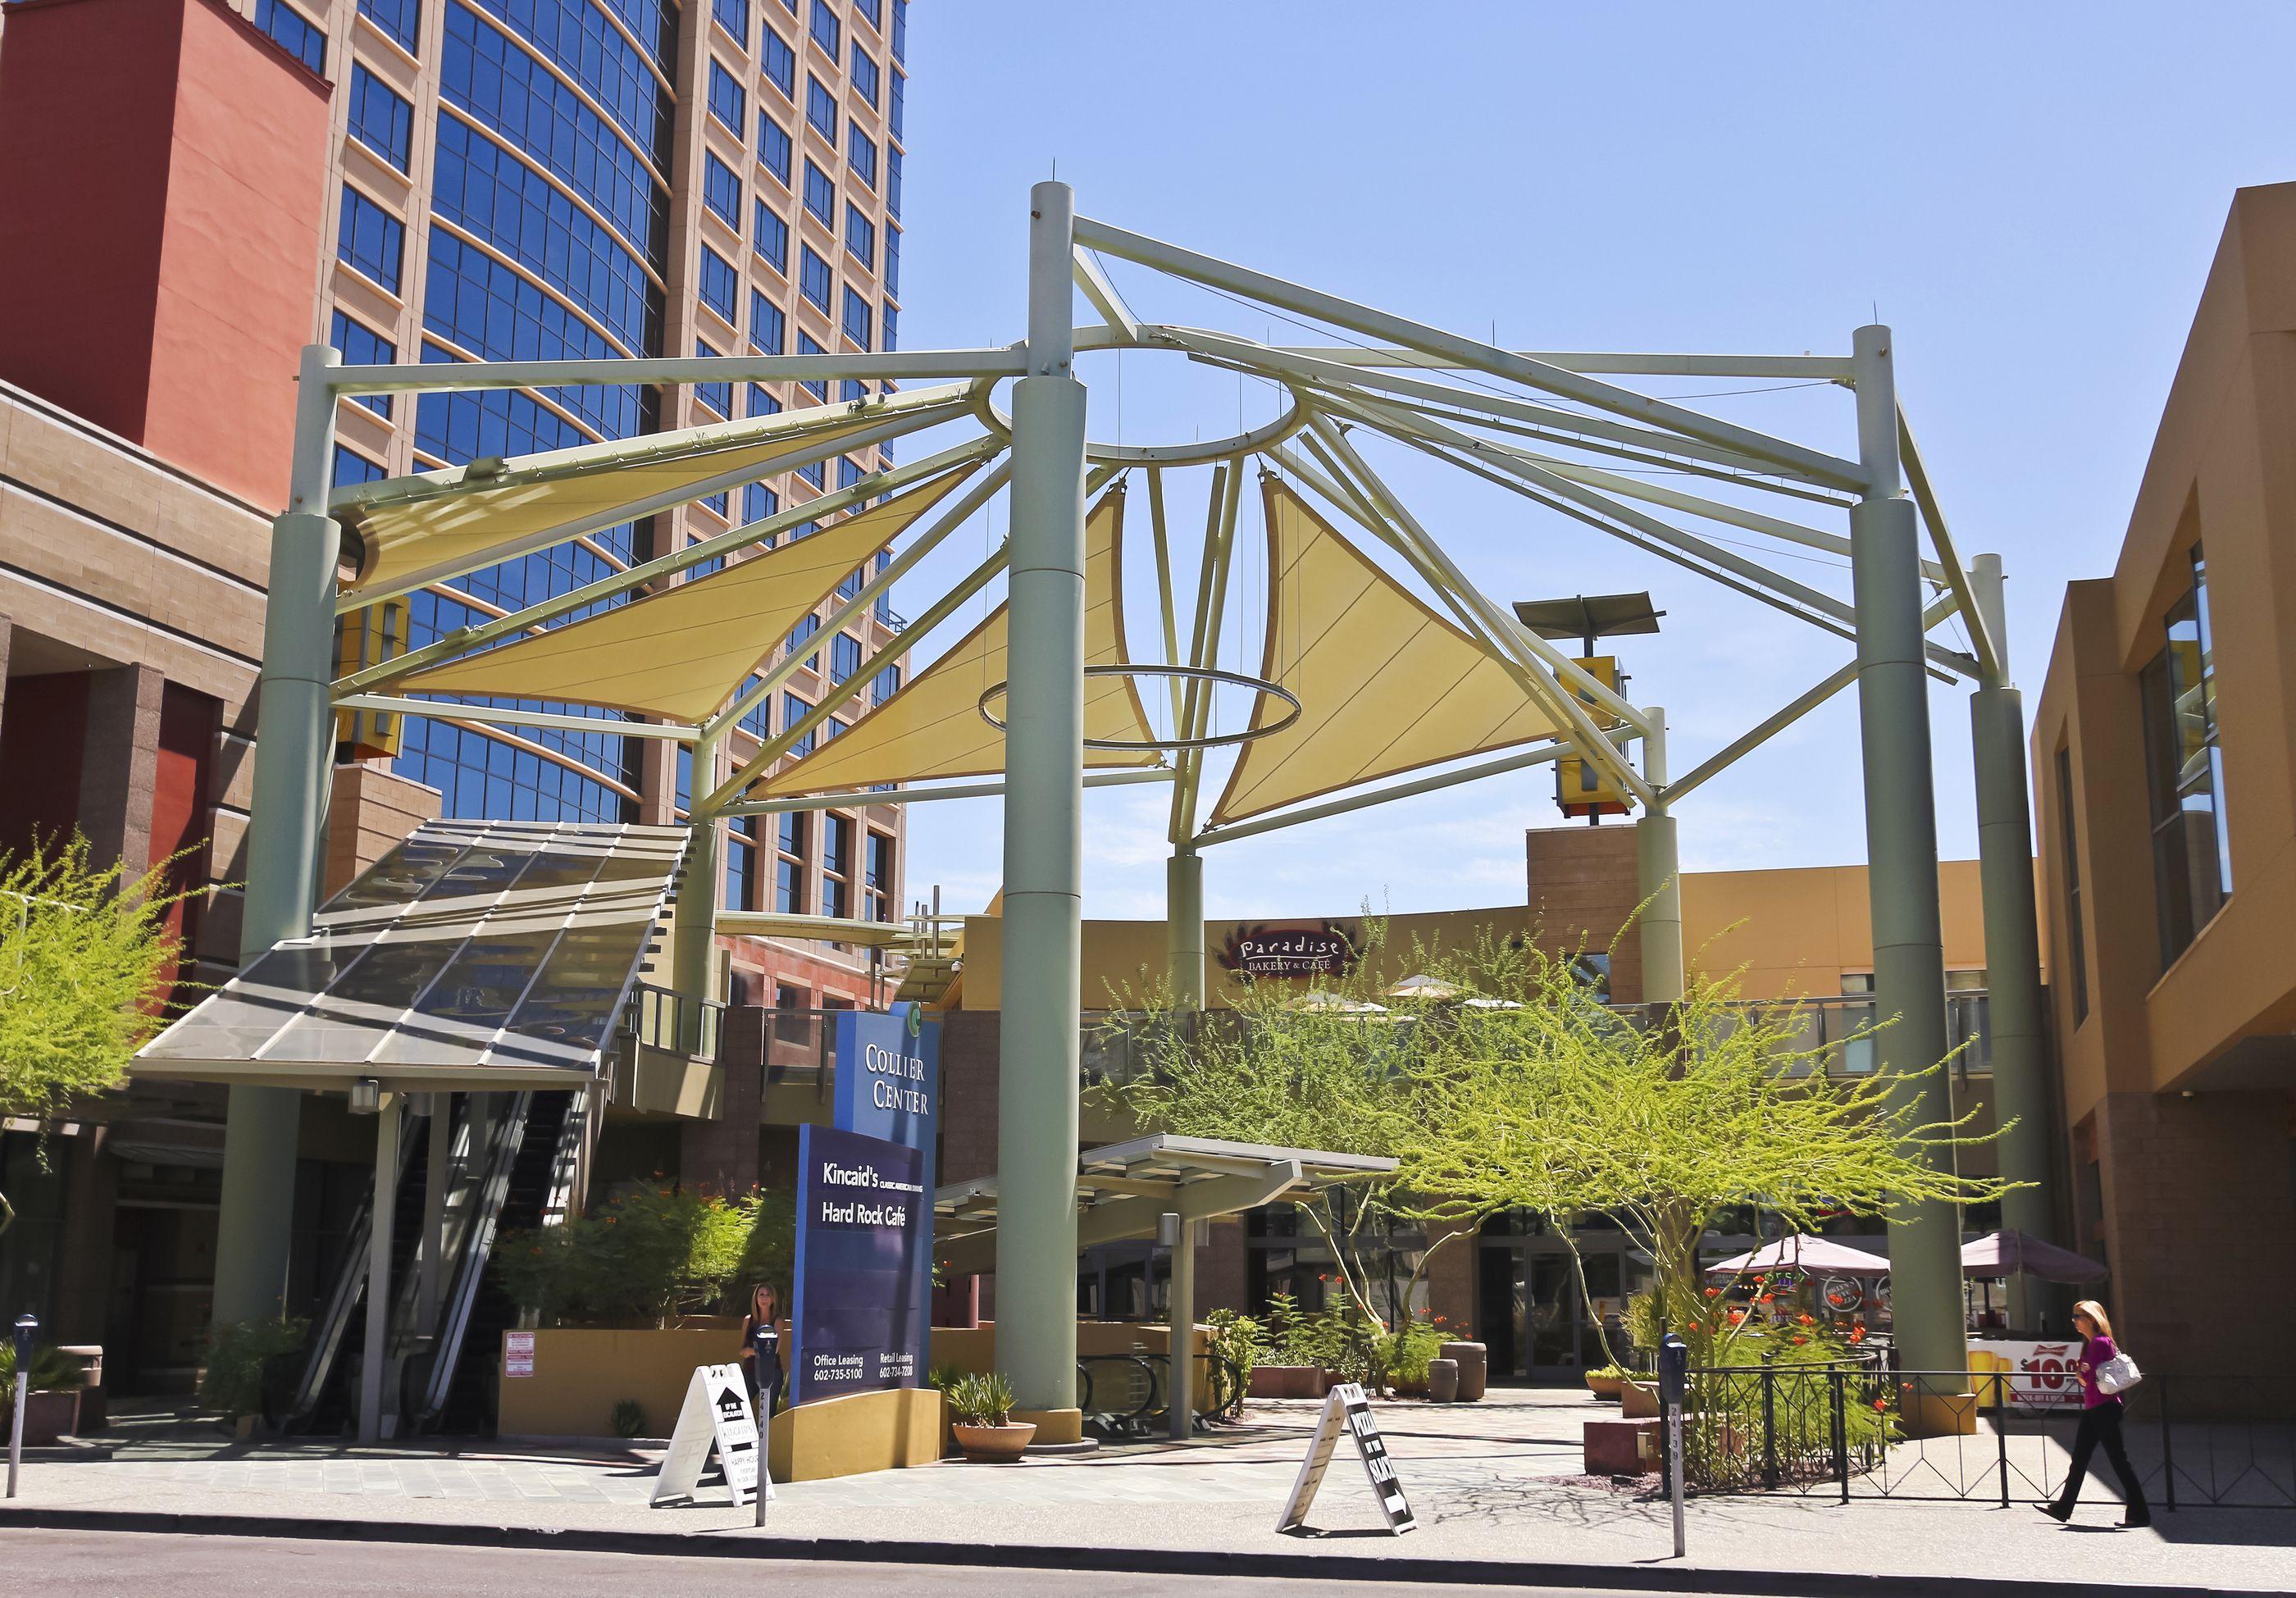 Asurea In Phoenix Arizona Permanent Life Insurance Best